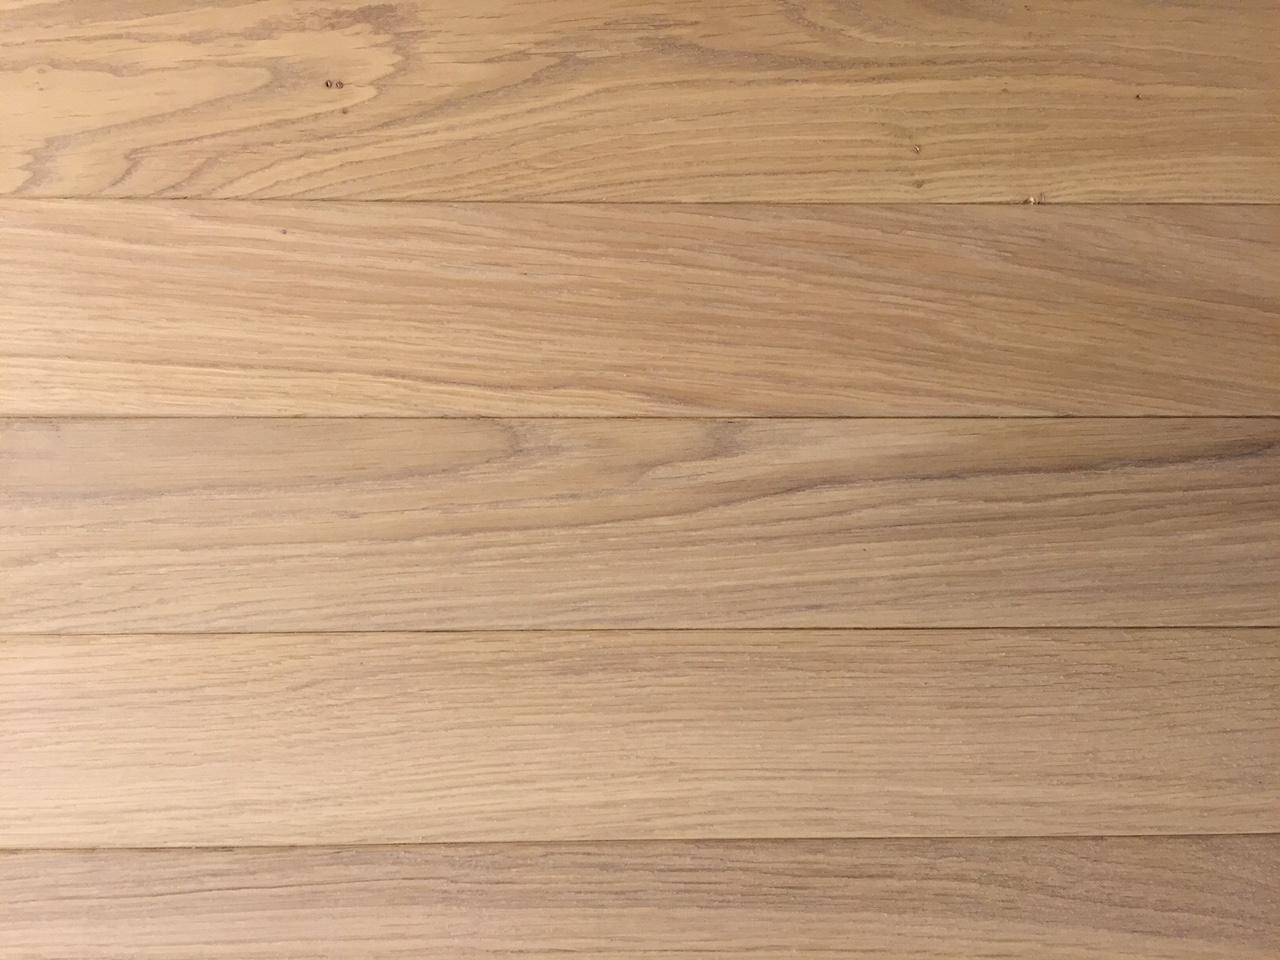 Texture pavimento finto legno texture pavimento grigio amazing